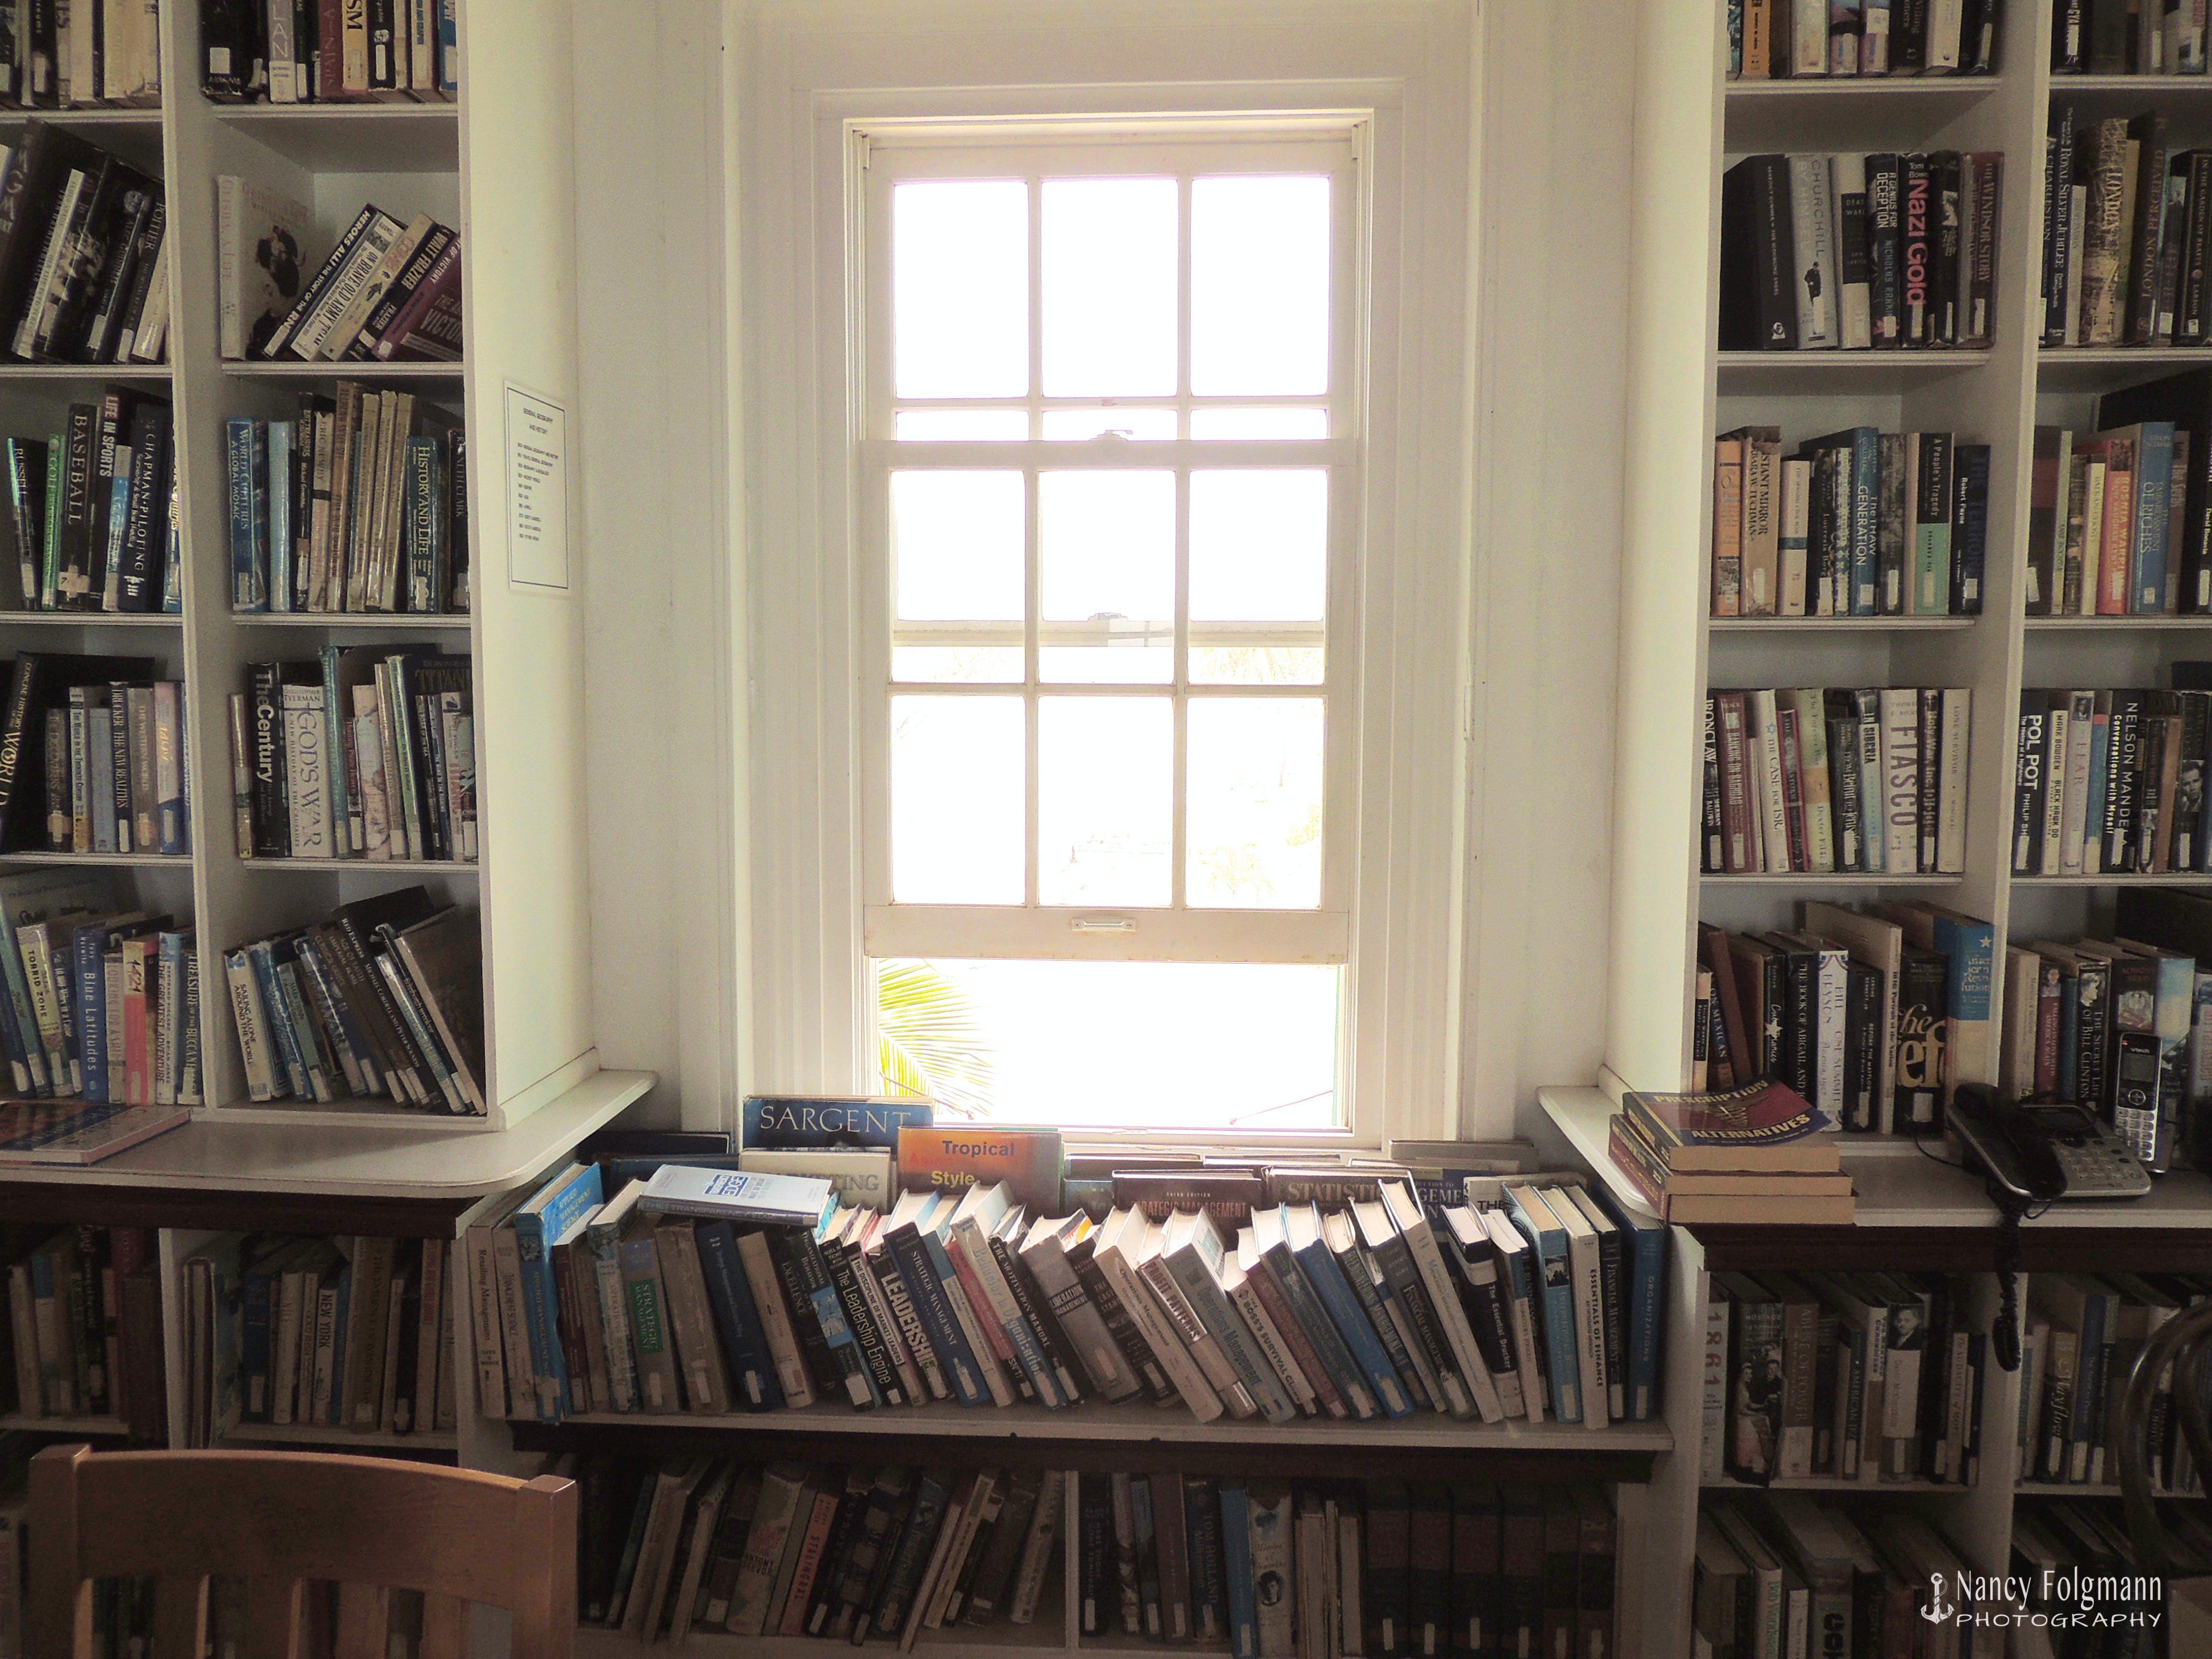 Free stock photo of book shelf, book shelves, book stack, books